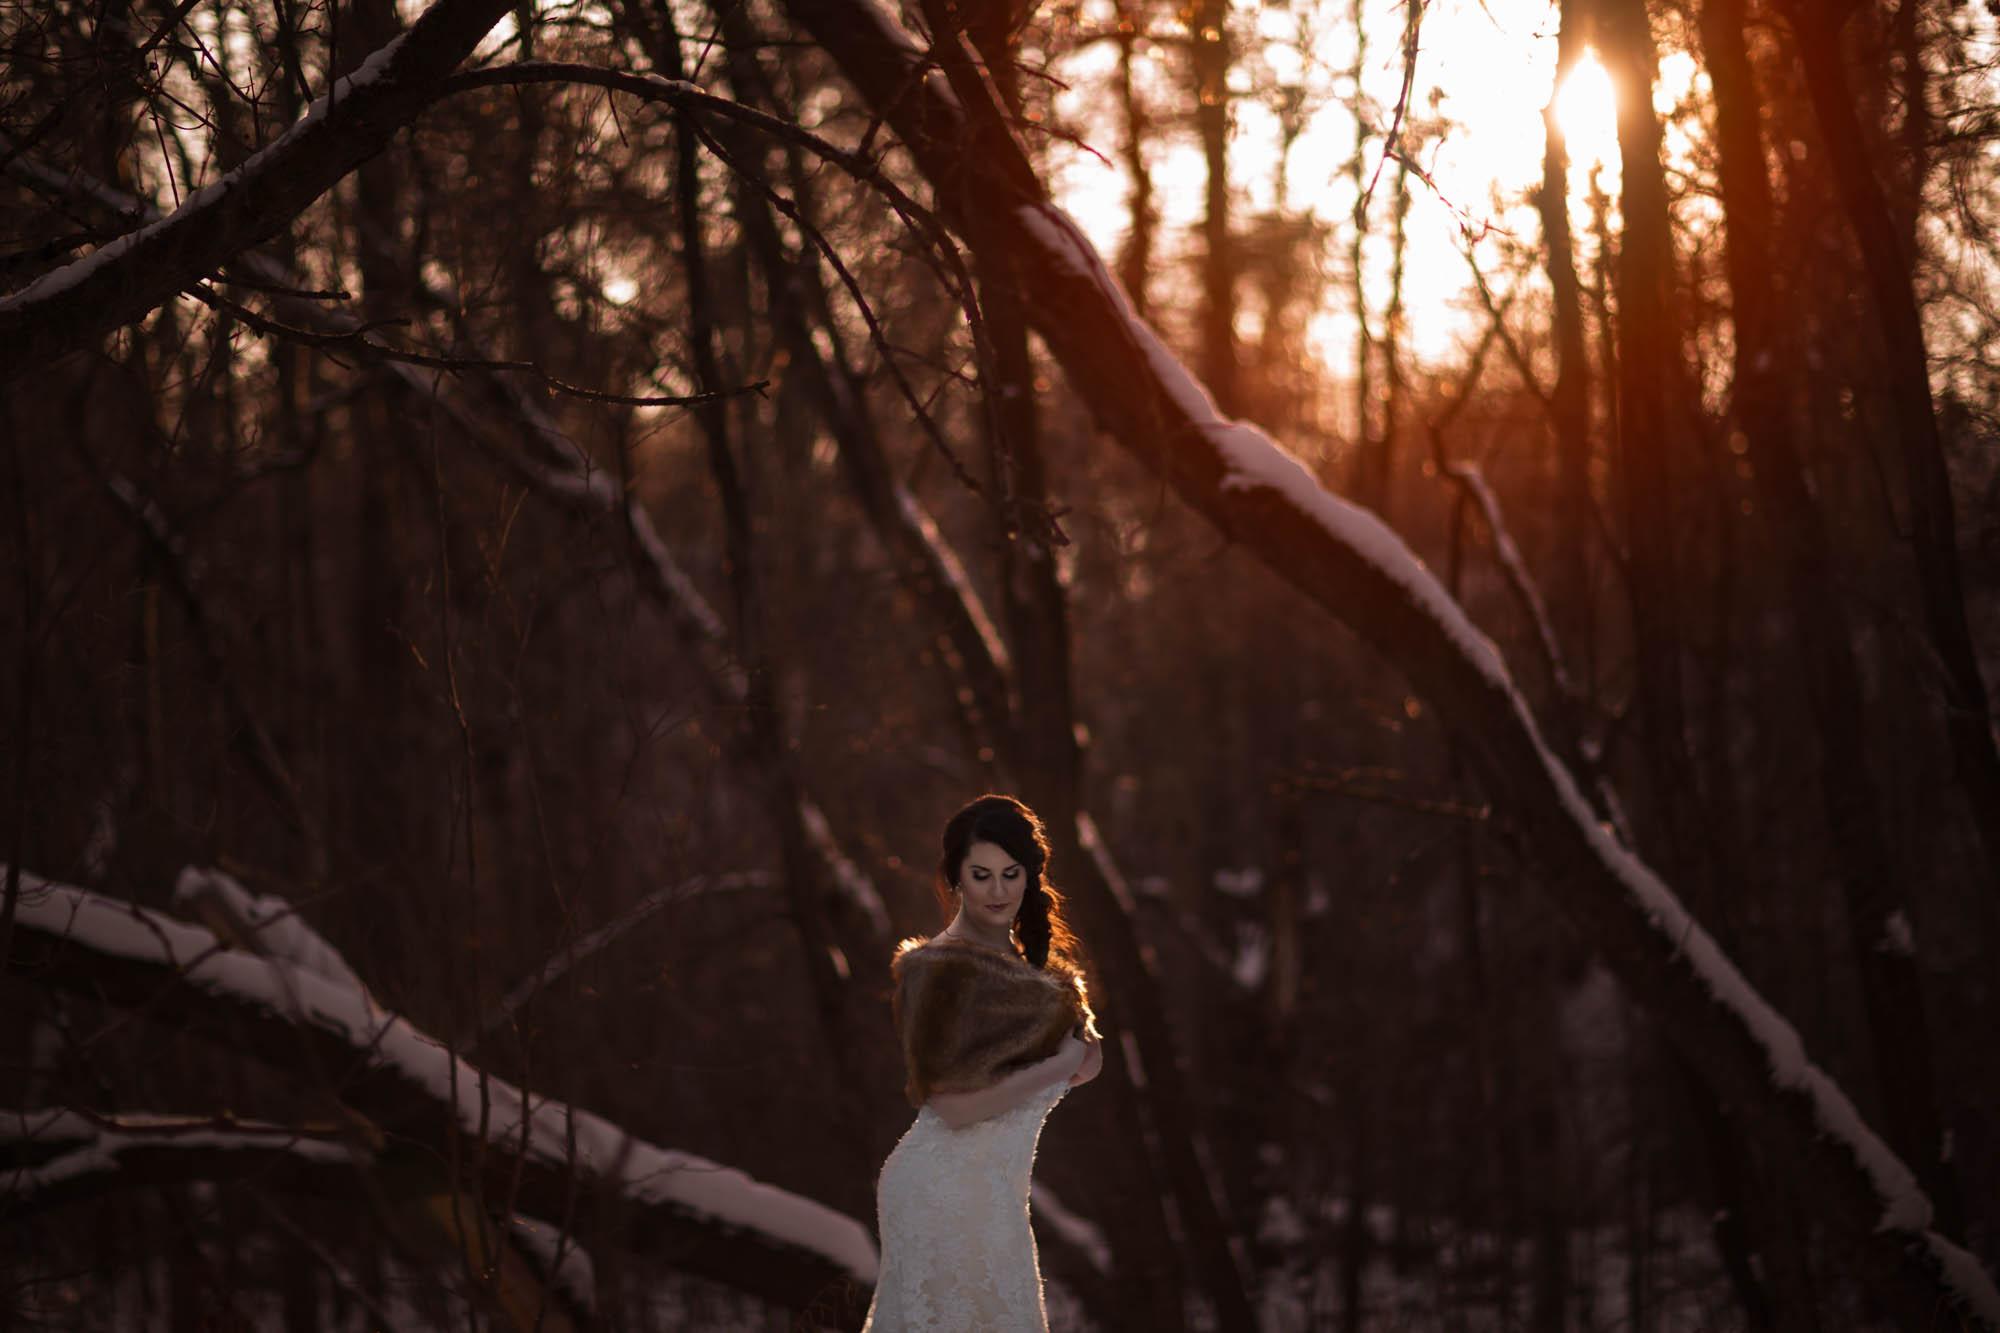 Bree-LynnMistolPhotography 002